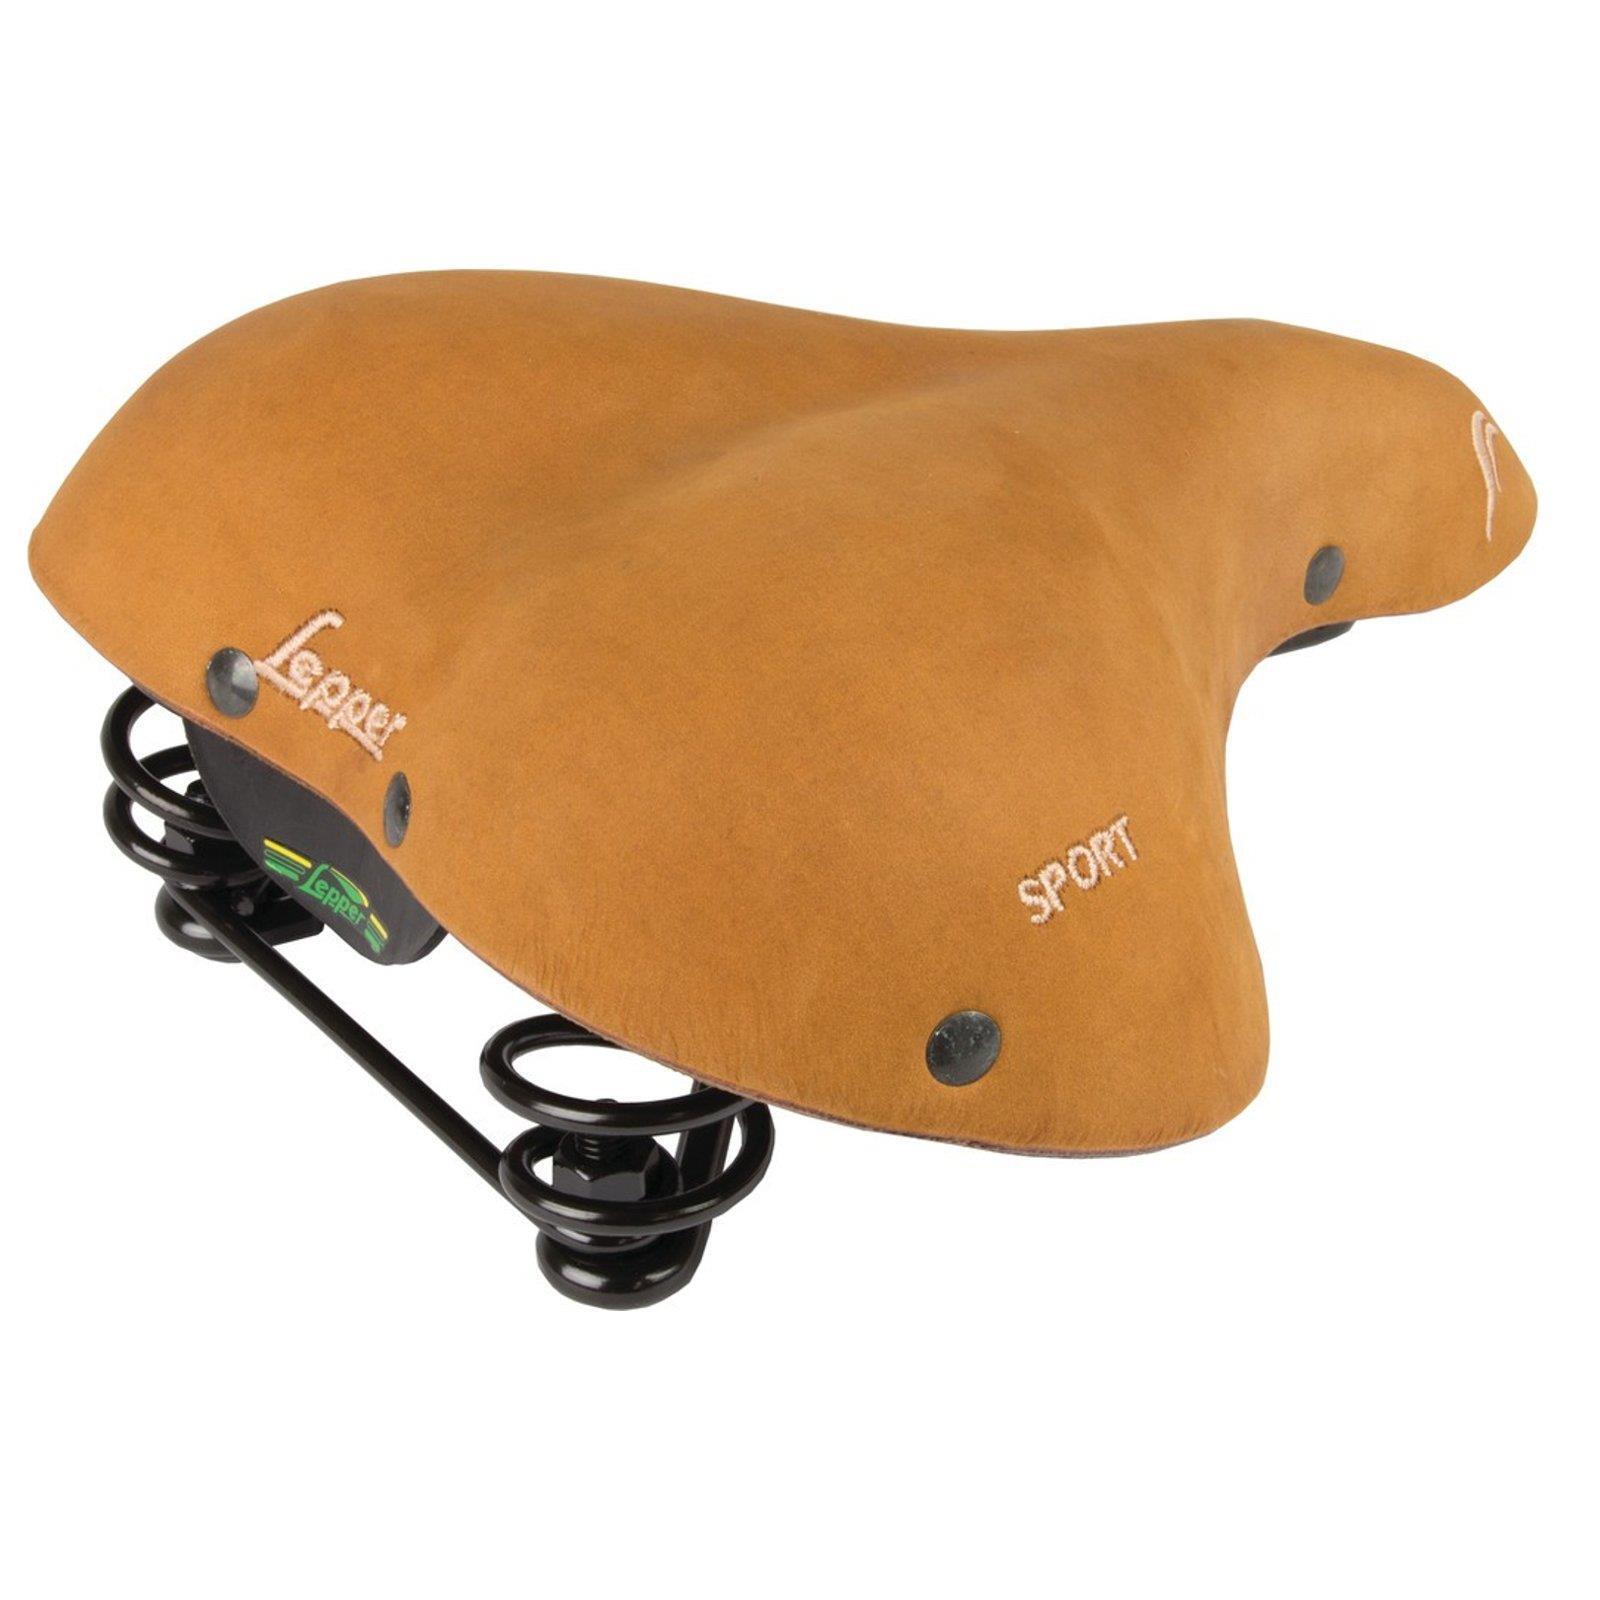 Lepper Fahrrad Sattel Lounger Sport Nubuk Leder Komfort Retro brown Natur Unisex